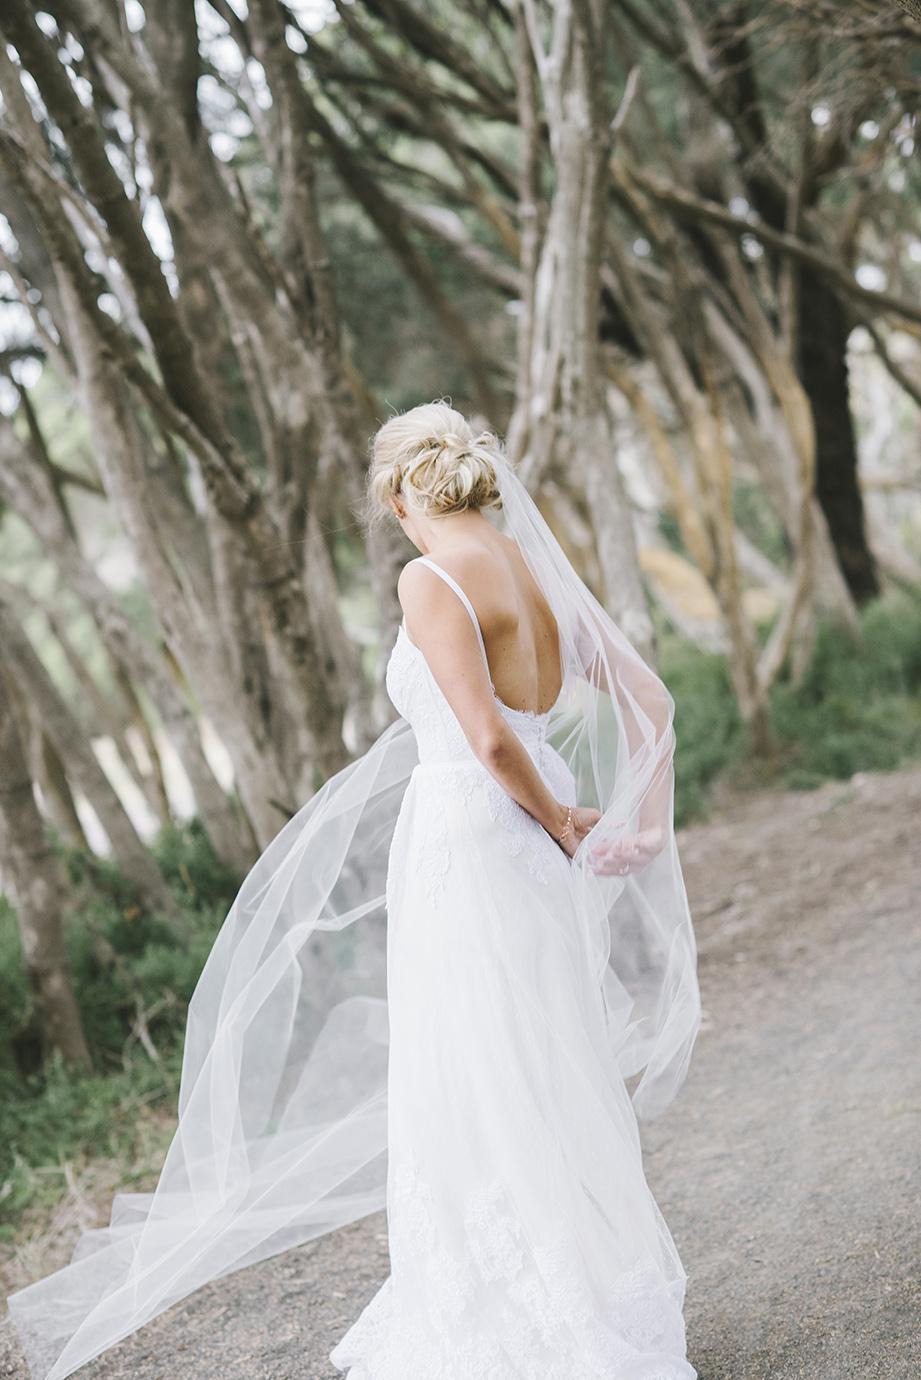 Brooke + Mark      Real Wedding     Bellarine Peninsula